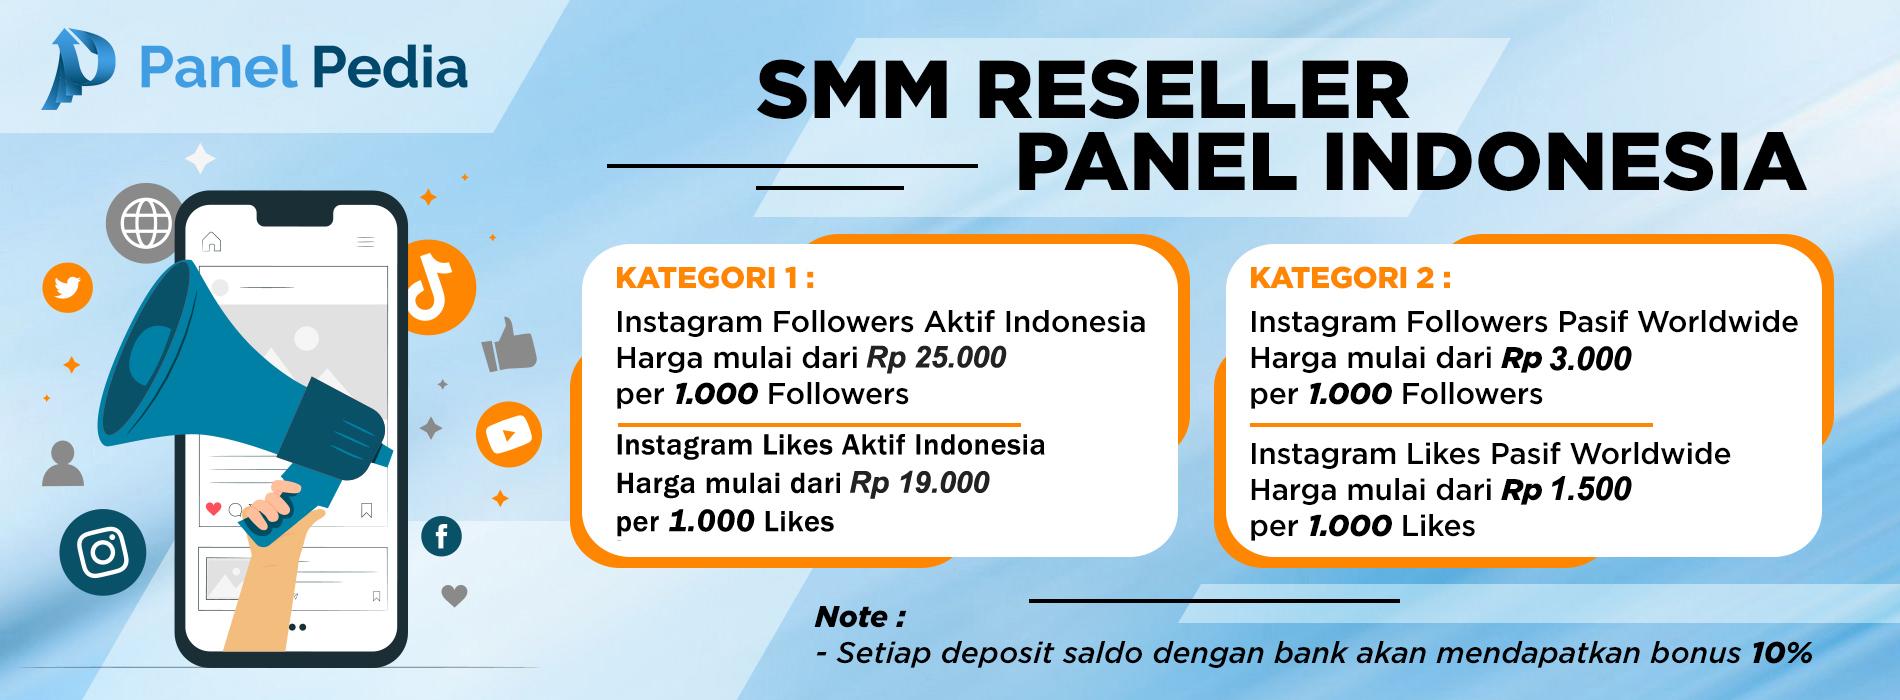 Panel Pedia Smm Reseller Panel Indonesia Termurah